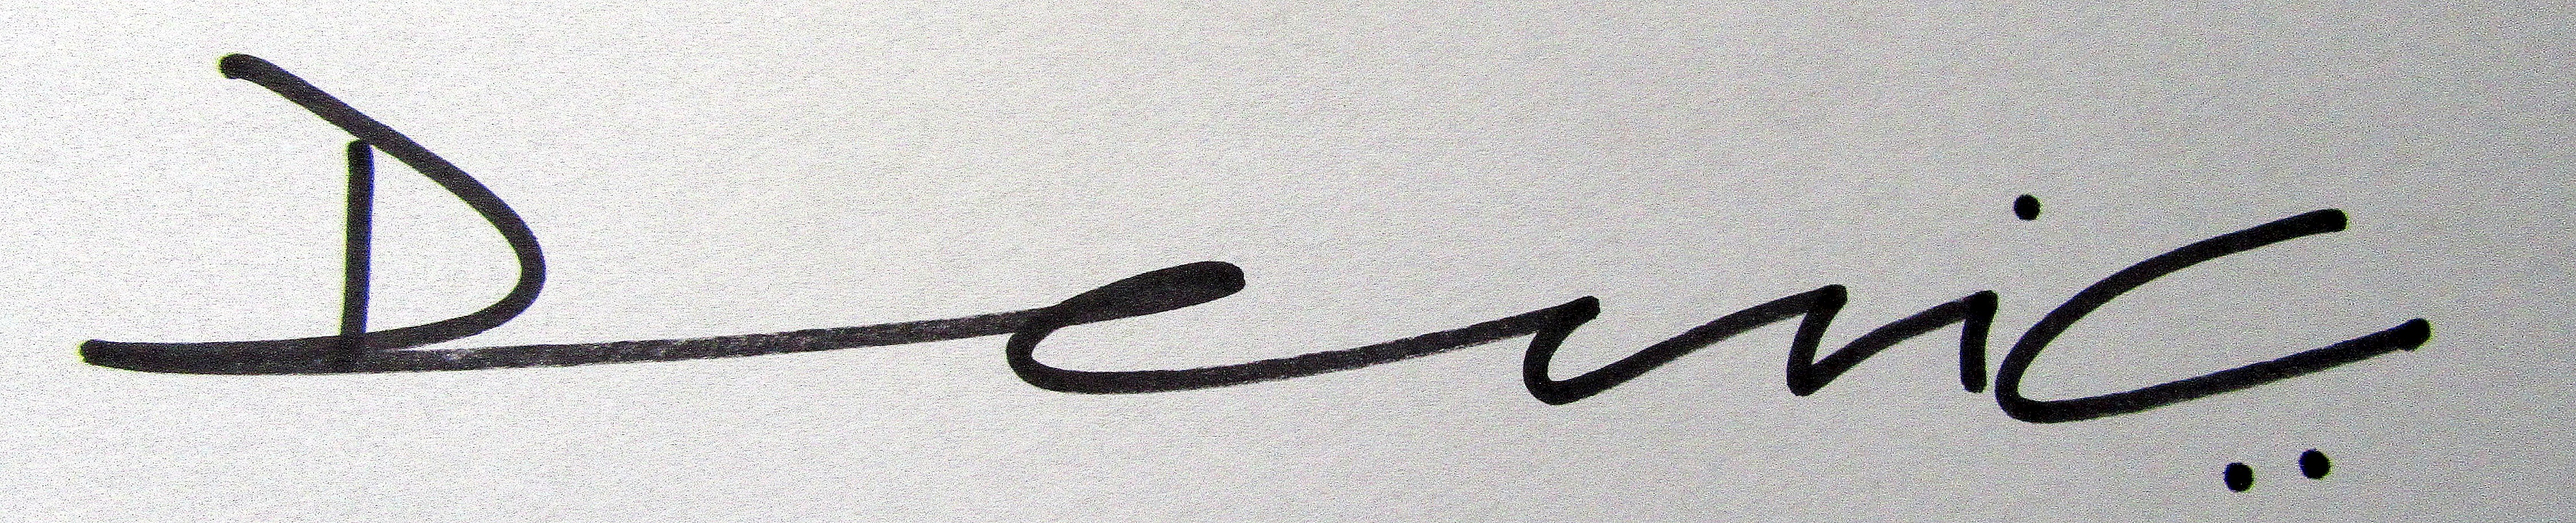 Deviprasad C Rao's Signature